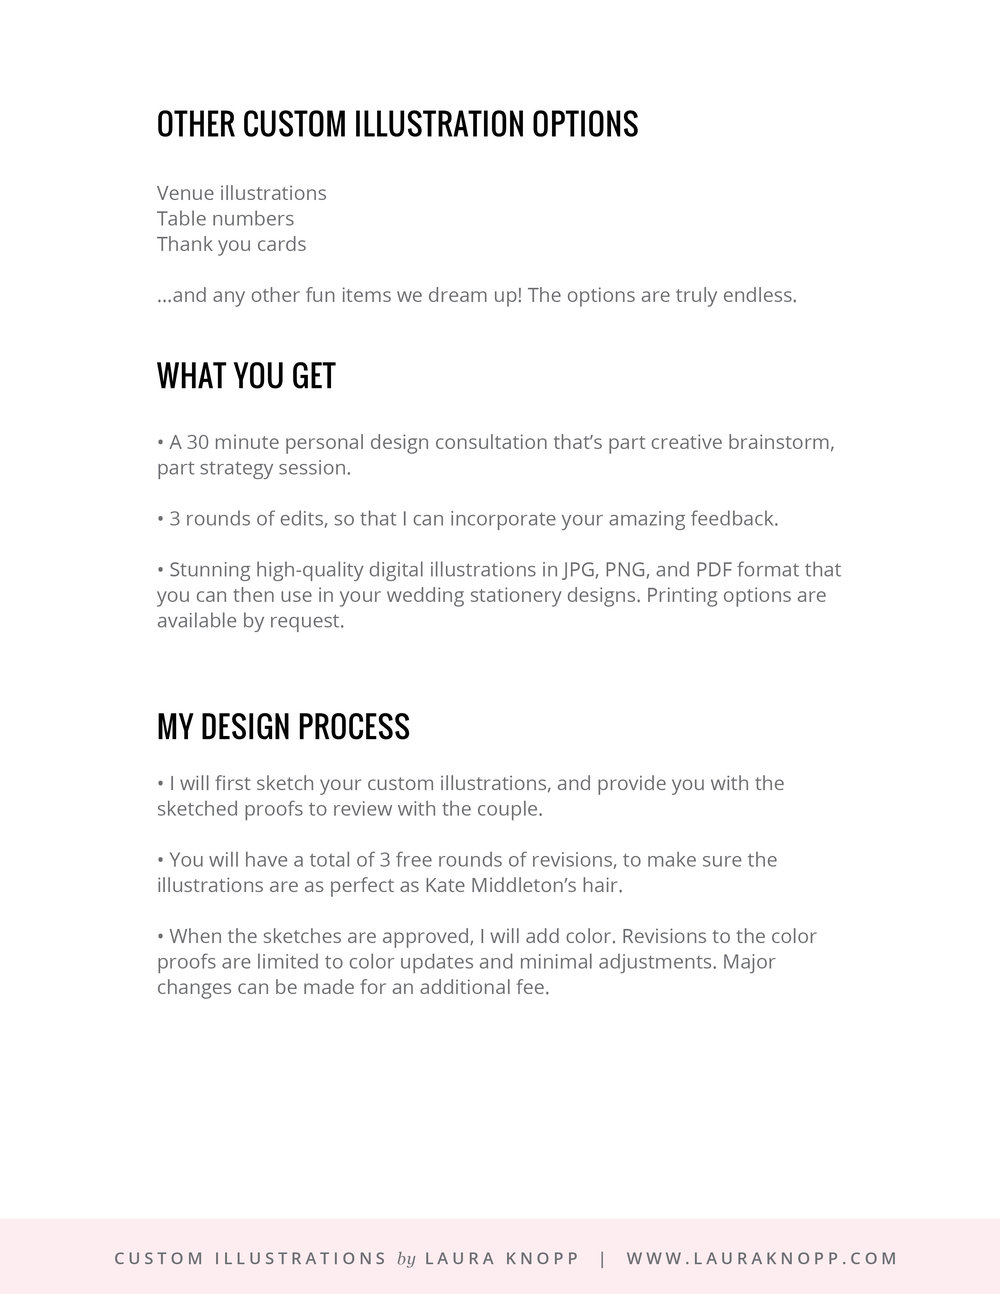 Custom-Wedding-Illustration-Guide6.jpg